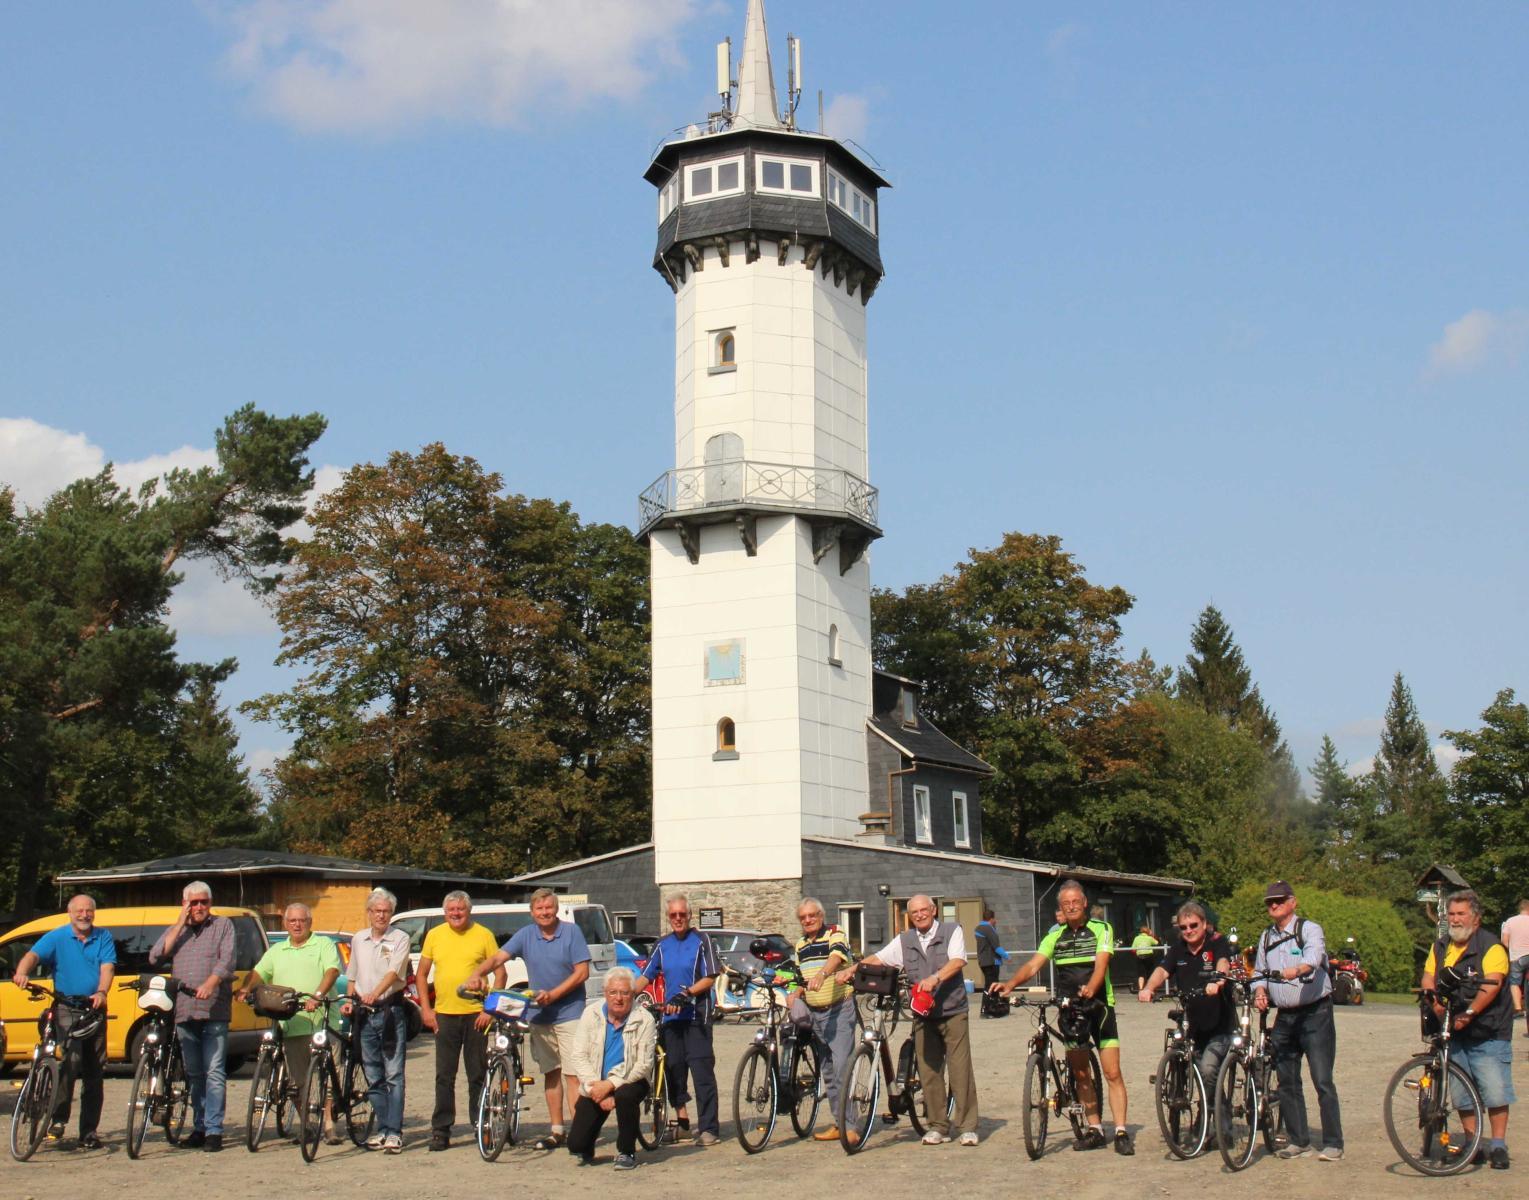 Gruppenfoto vor dem Fröbelturm in Oberweißbach (Foto © Anton Hofmann)